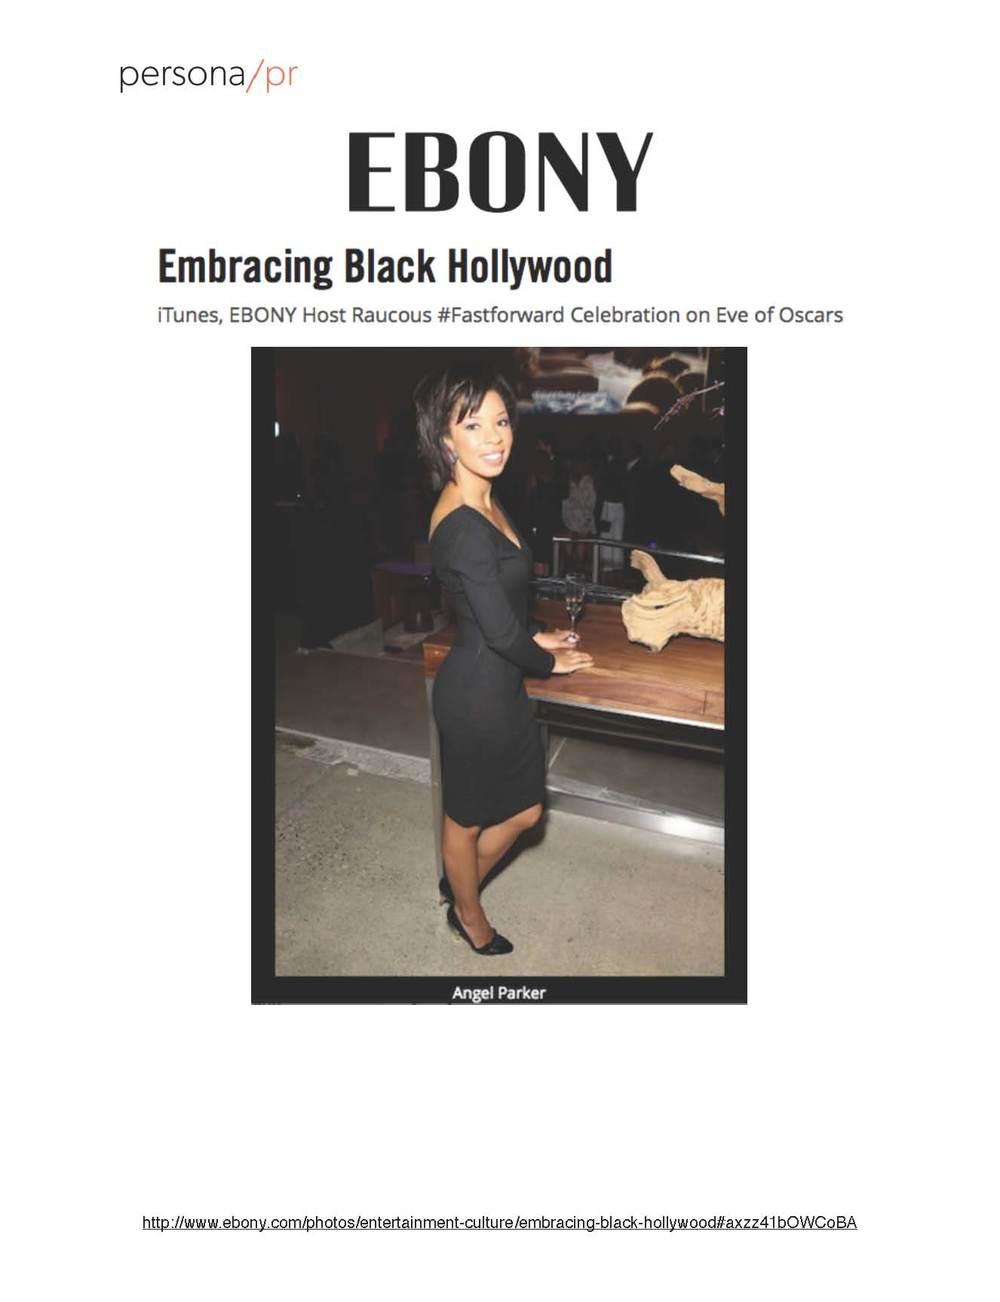 AngelParker-Ebony-02.28.16_Page_1.jpg